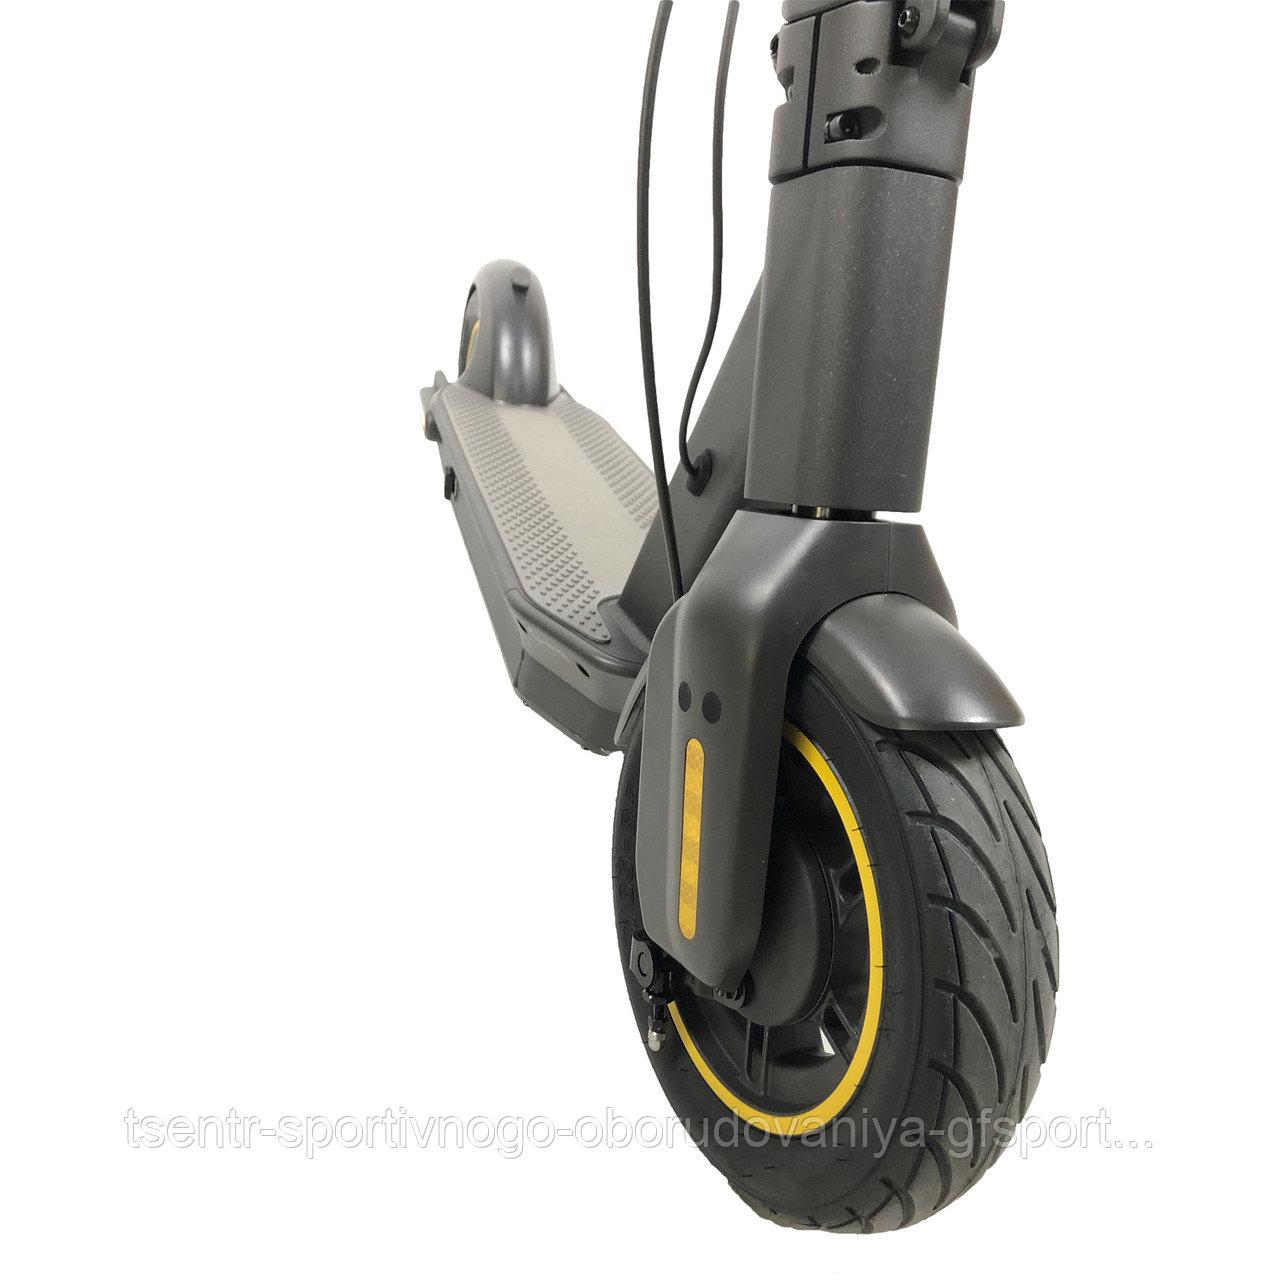 Электросамокат GF-Scooter Max RR-30 - фото 8